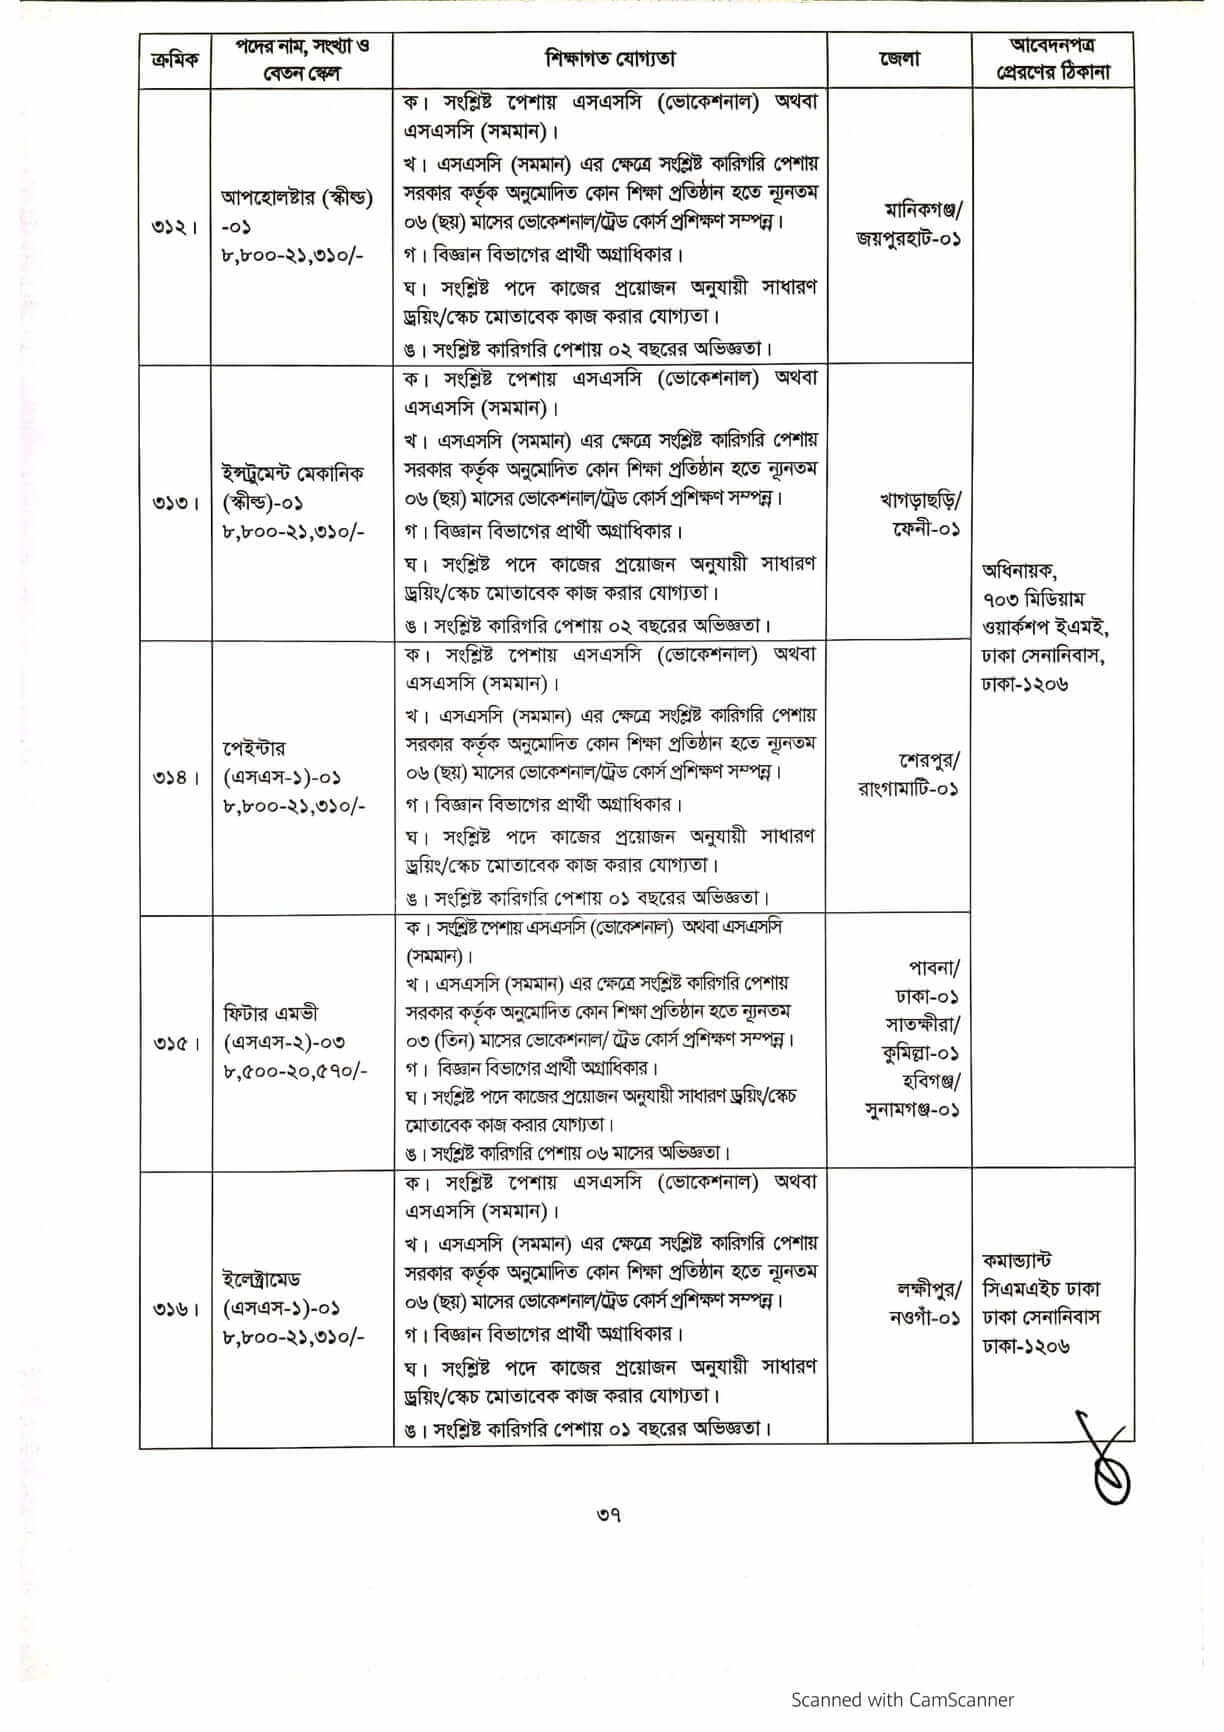 Www Army mil BD job application form